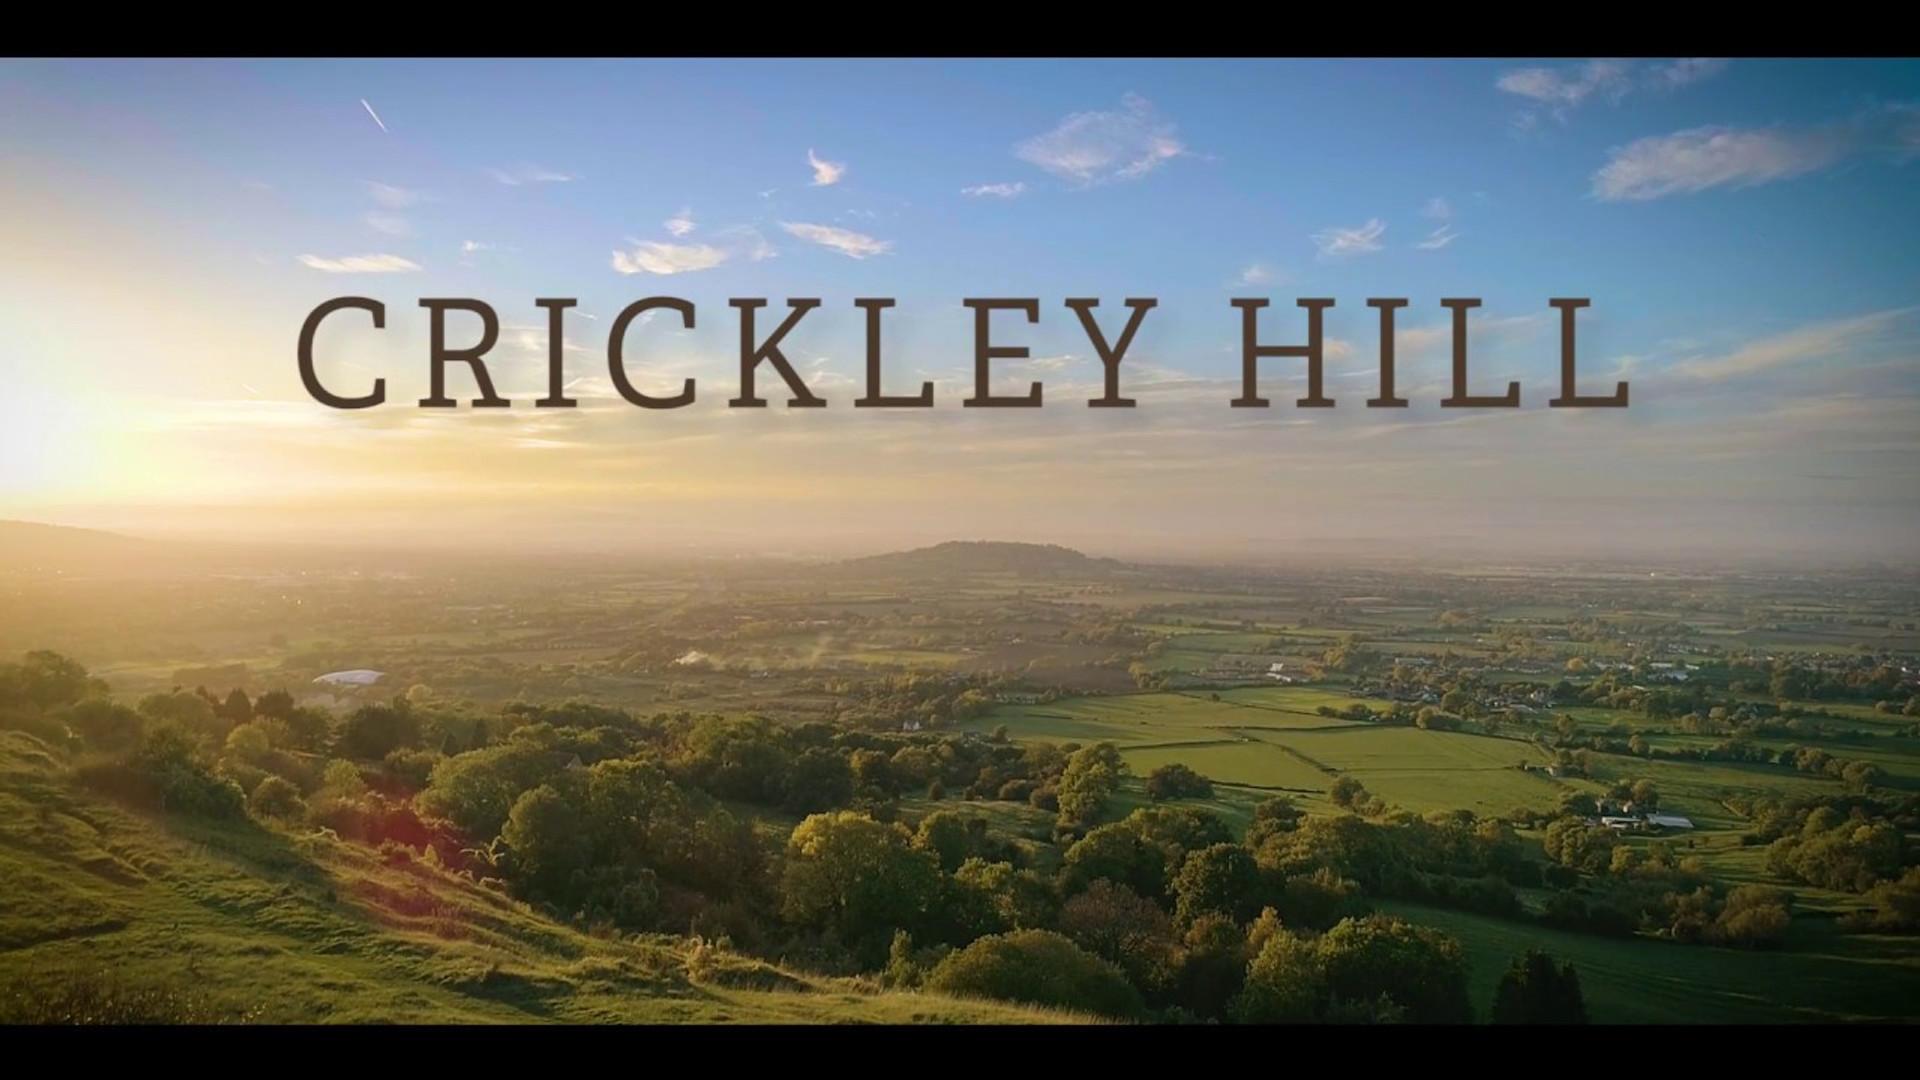 Crickley Hill Nature Reserve